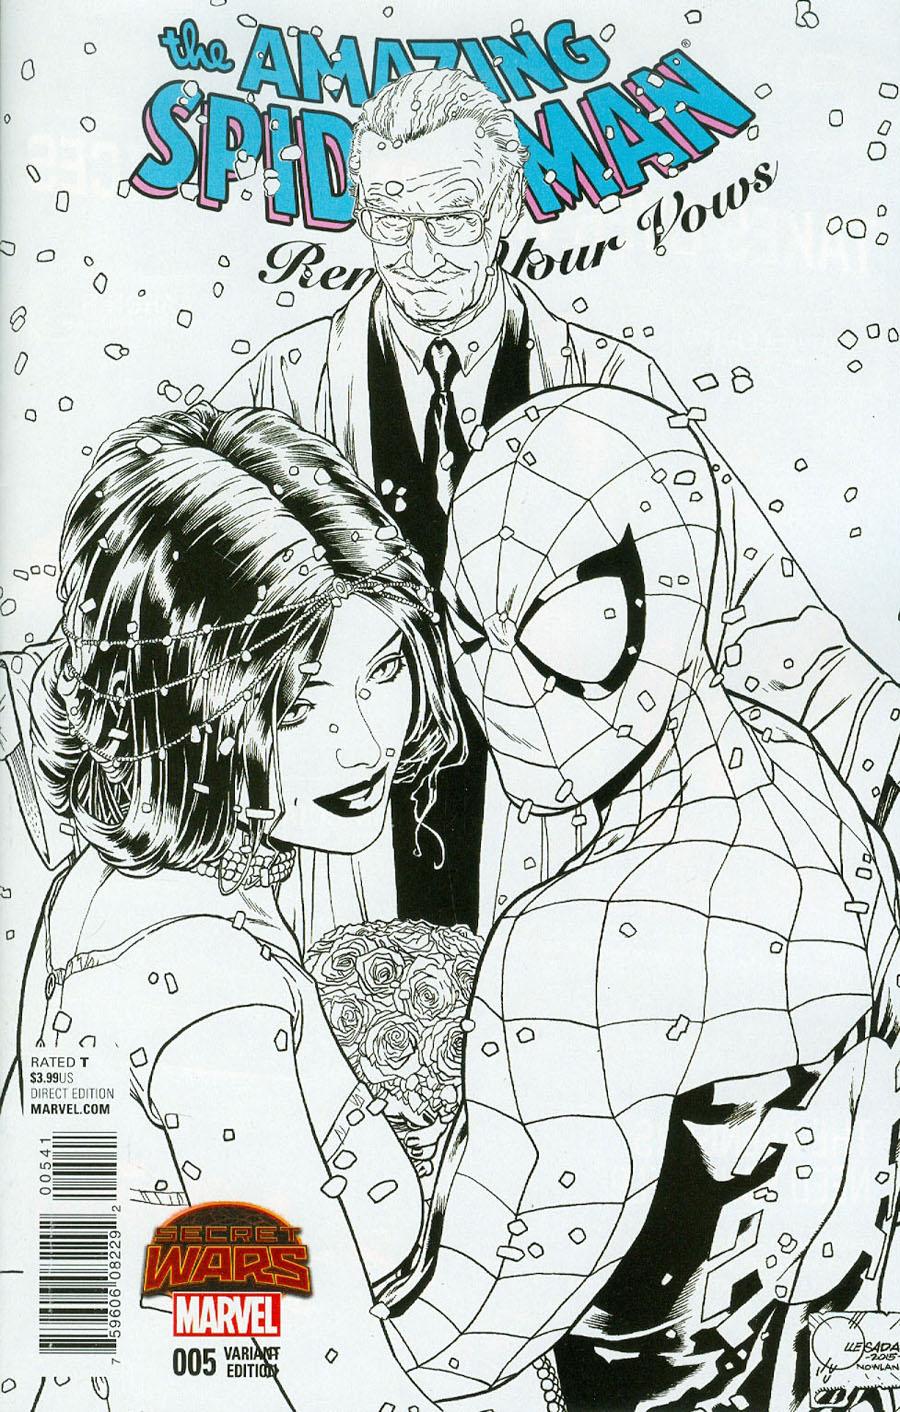 Amazing Spider-Man Renew Your Vows #5 Cover D Incentive Joe Quesada Sketch Variant A Cover (Secret Wars Warzones Tie-In)